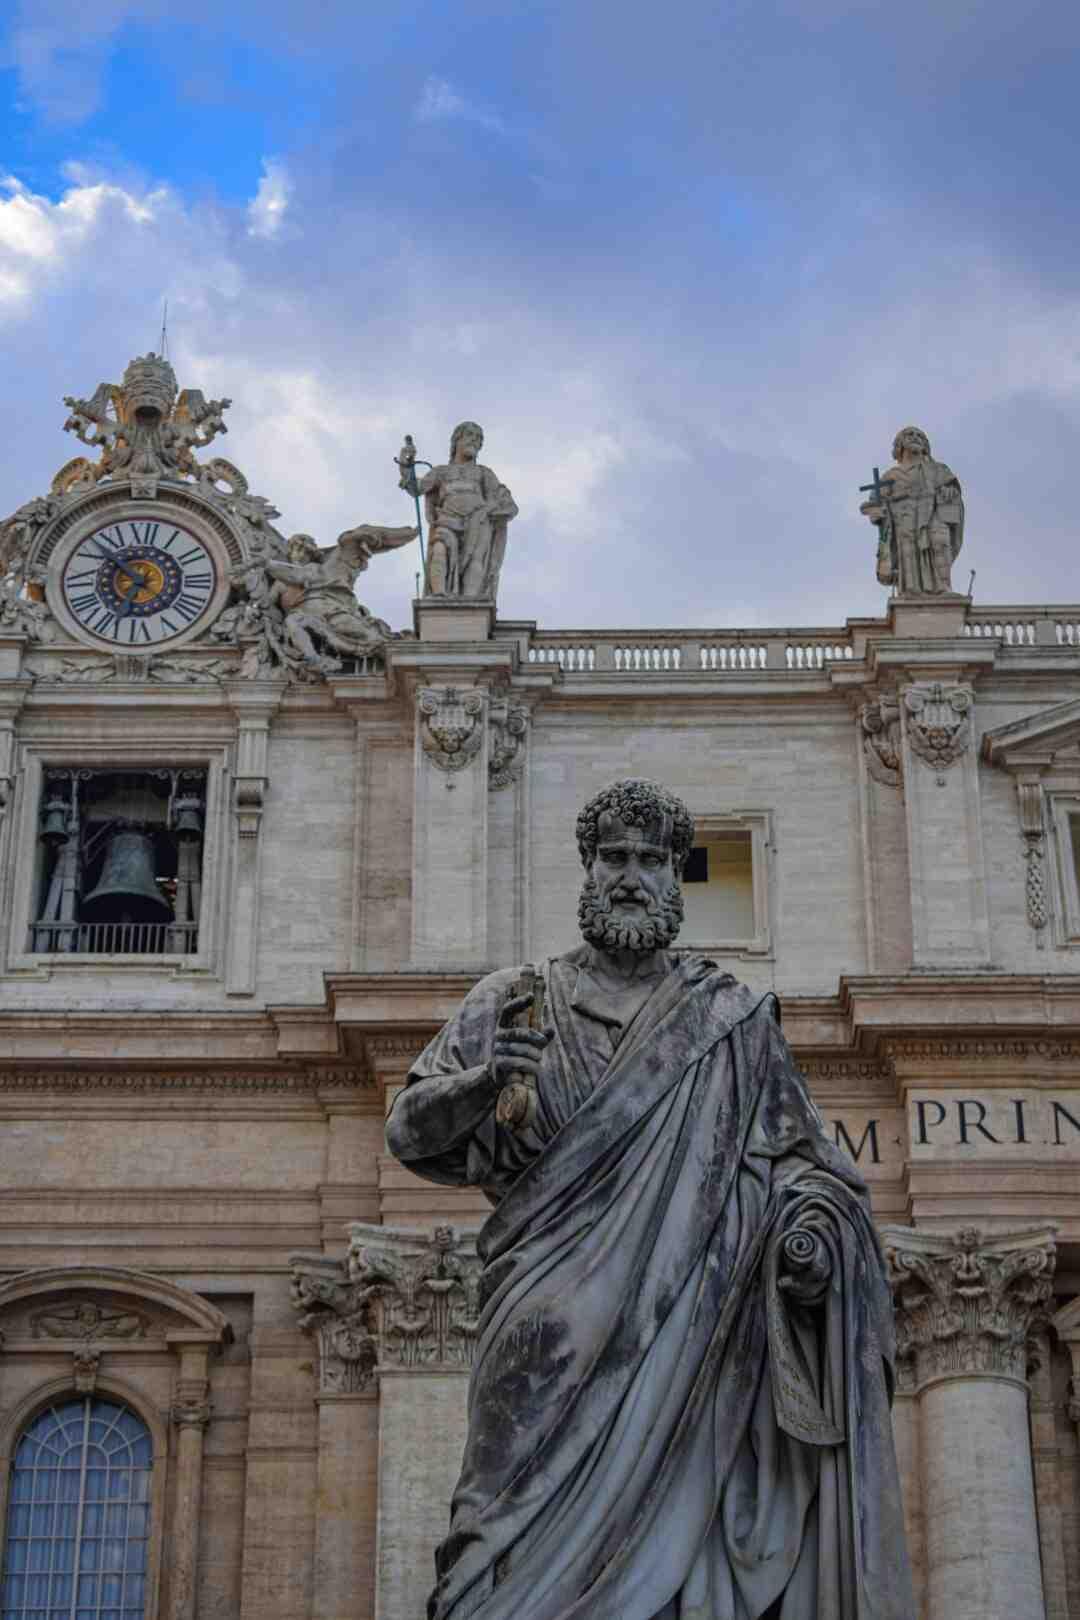 Come prenotare visita cupola San Pietro?